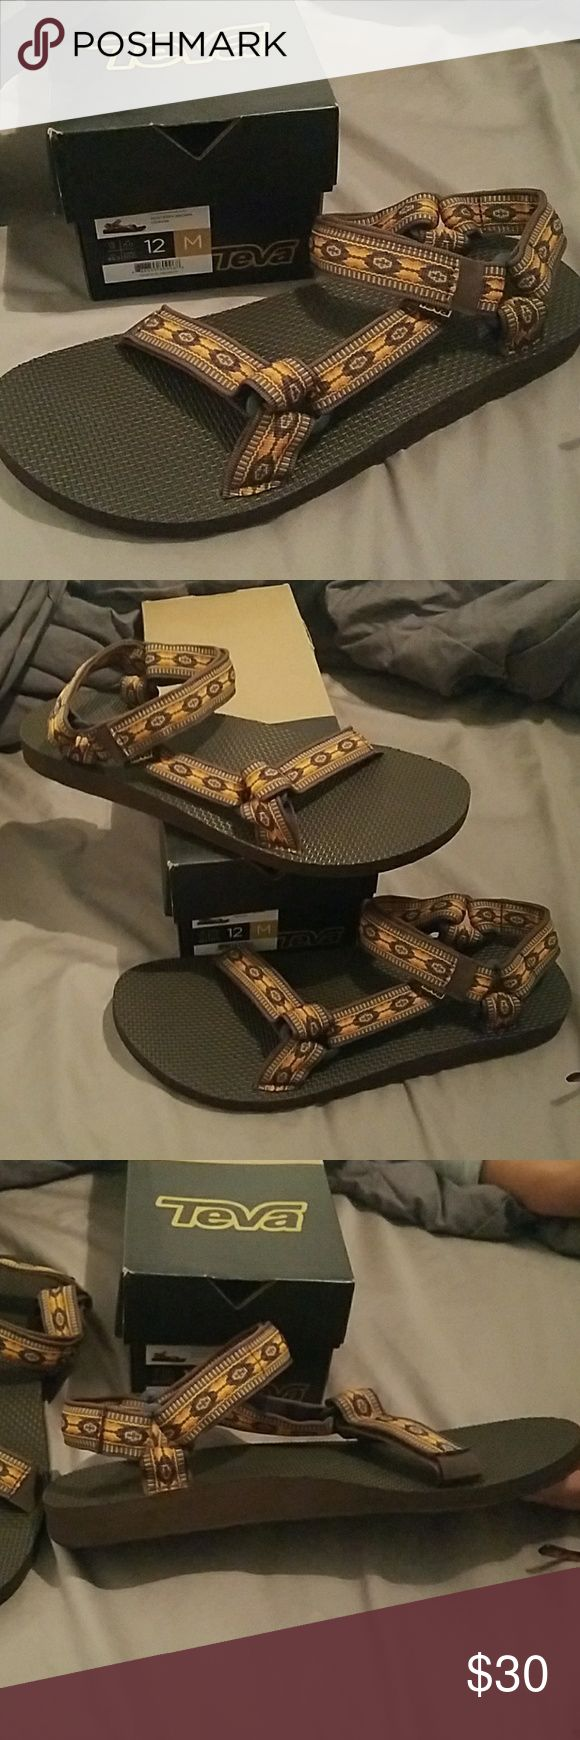 Teva, Men's sandals Aztec print Teva, Men's sandals, brown with beautiful Aztec print design. Velcro closure. Design colors are: brown, orange, gold & black. True to size. Size: 12 M Teva Shoes Sandals & Flip-Flops